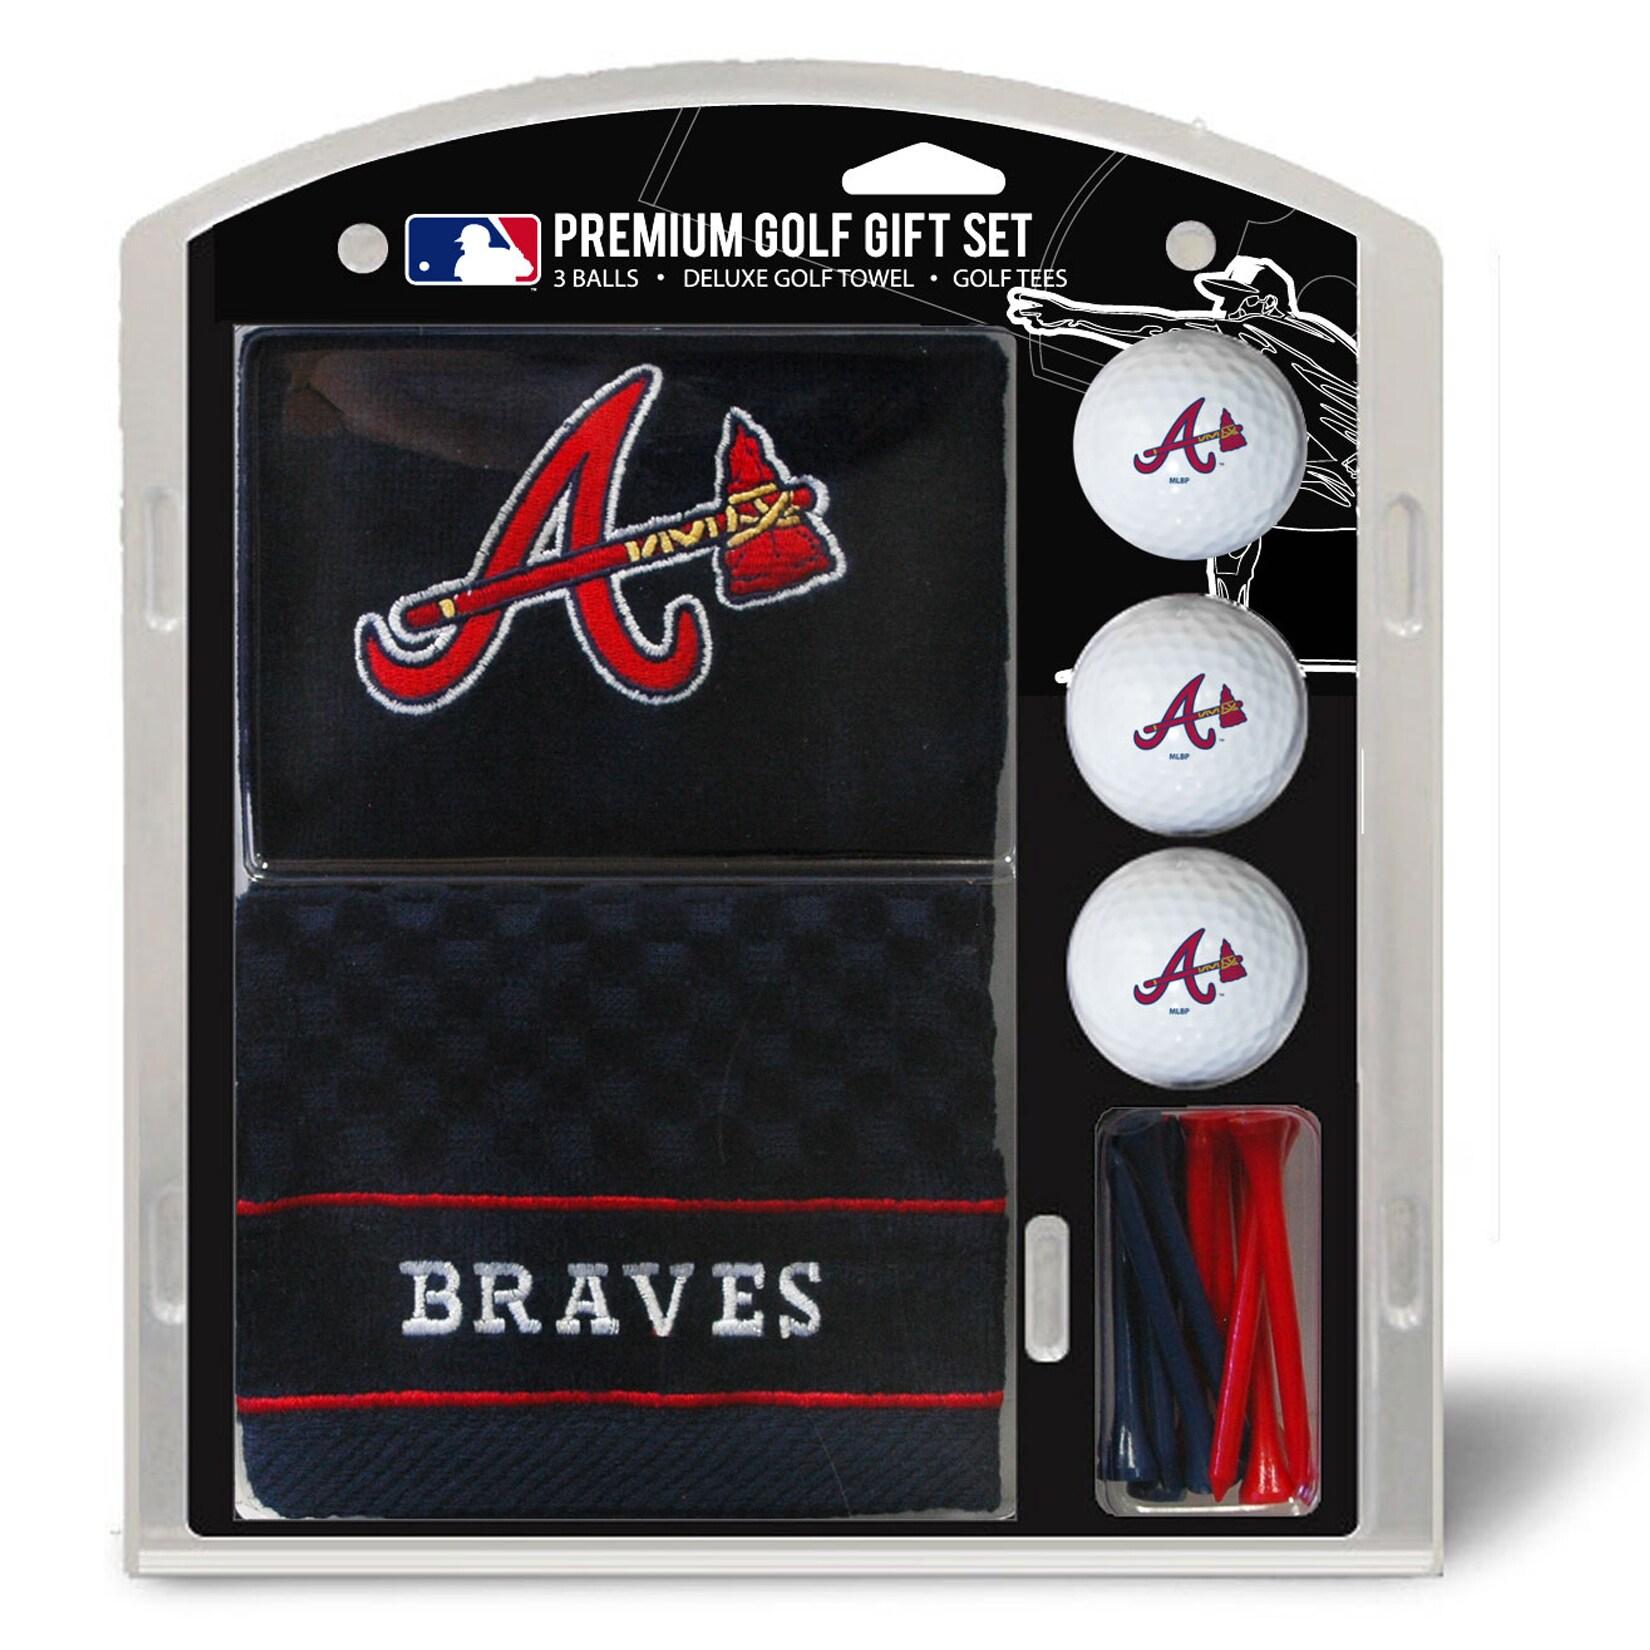 Atlanta Braves Embroidered Golf Gift Set